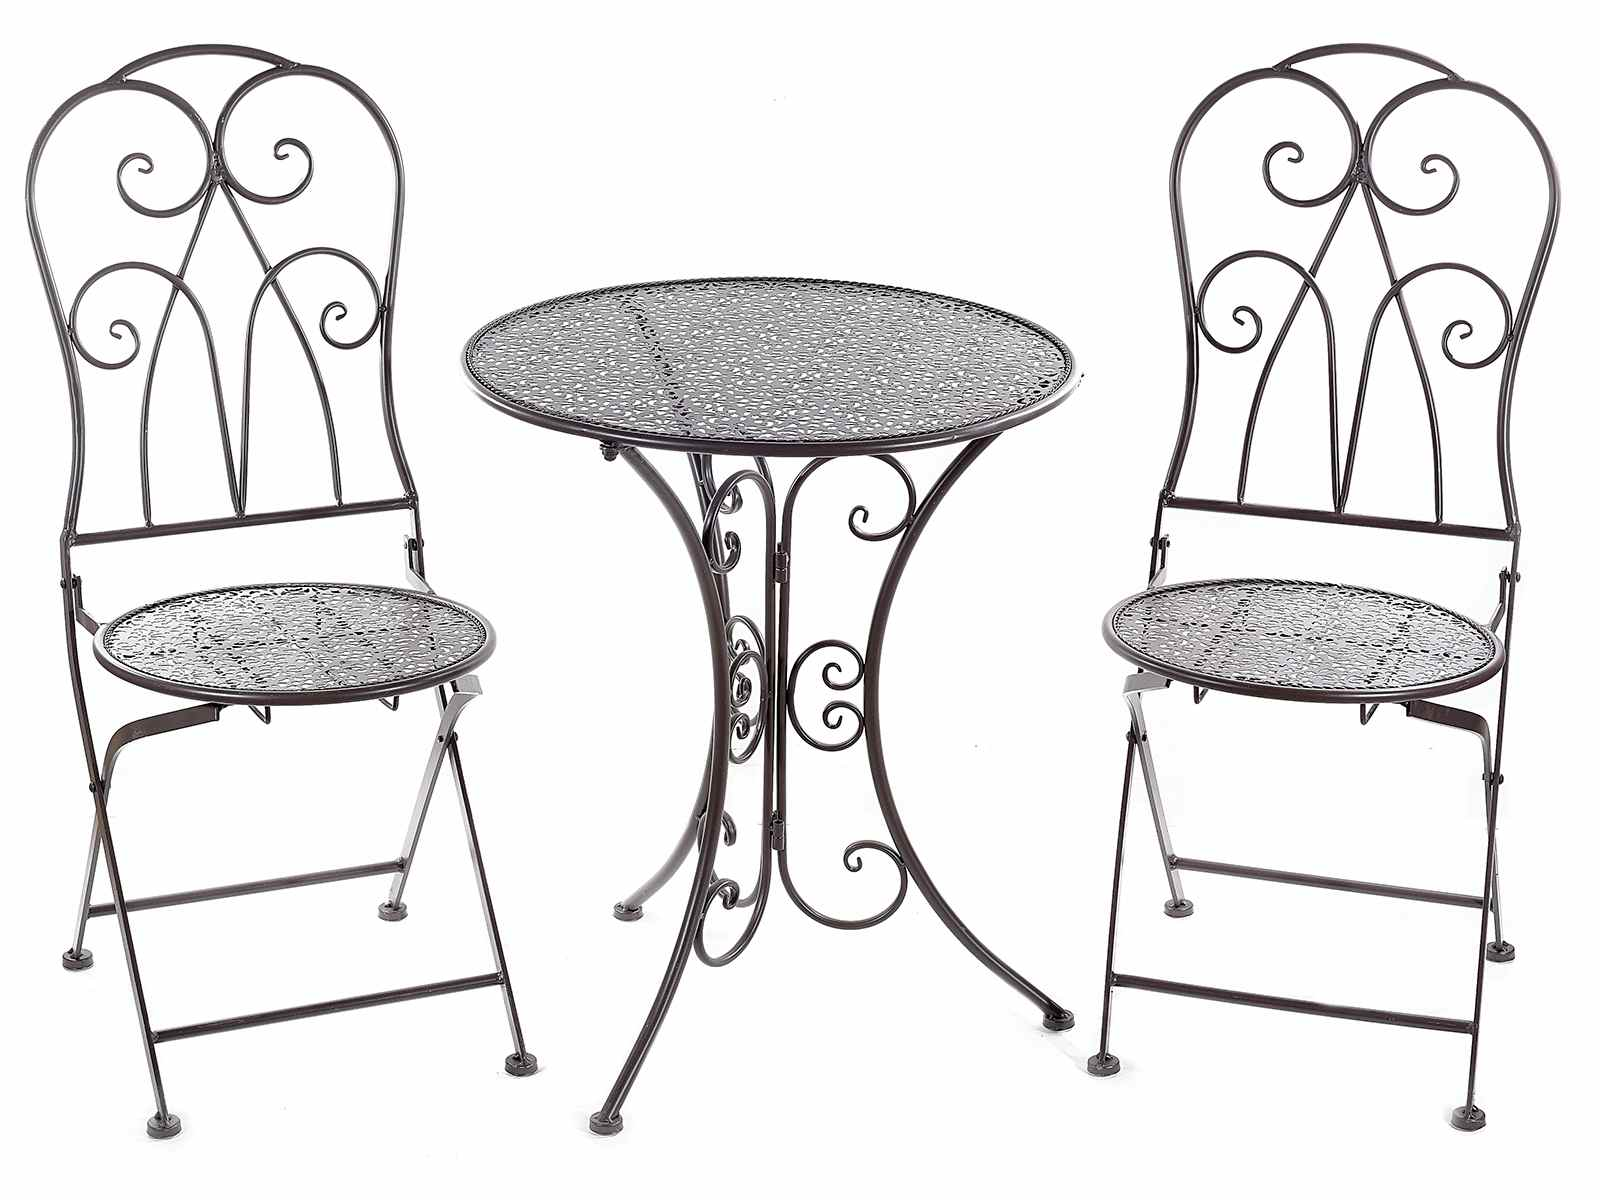 Tavoli E Sedie Da Giardino In Metallo.Set Tavolo E 2 Sedie Da Giardino In Metallo Scuro Traforato 53 21